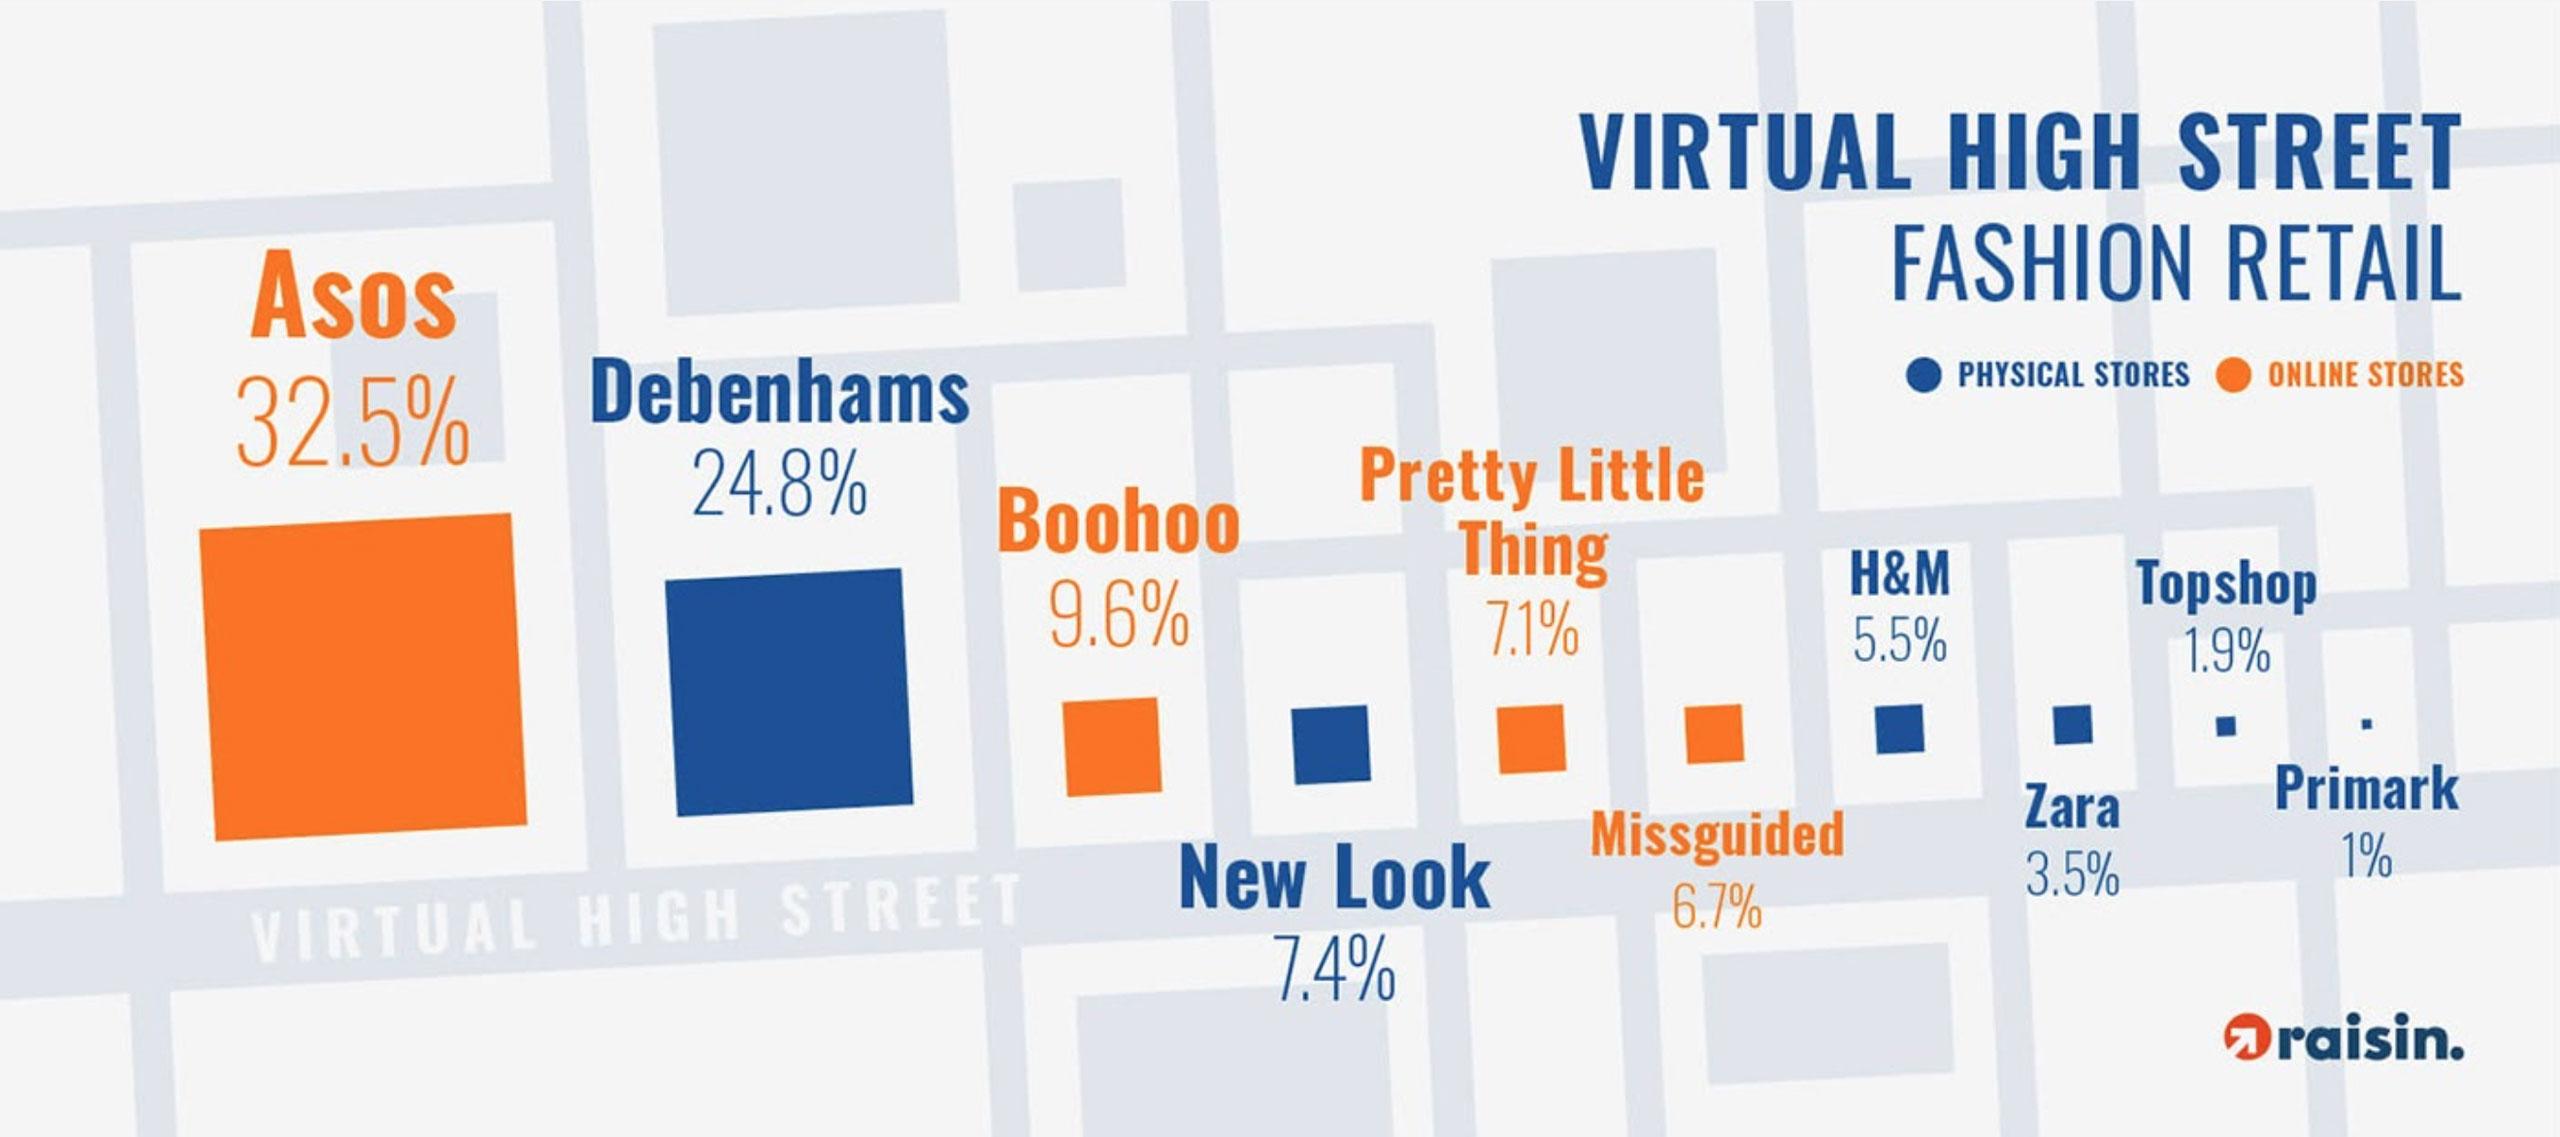 Virtual high street - fashion retail